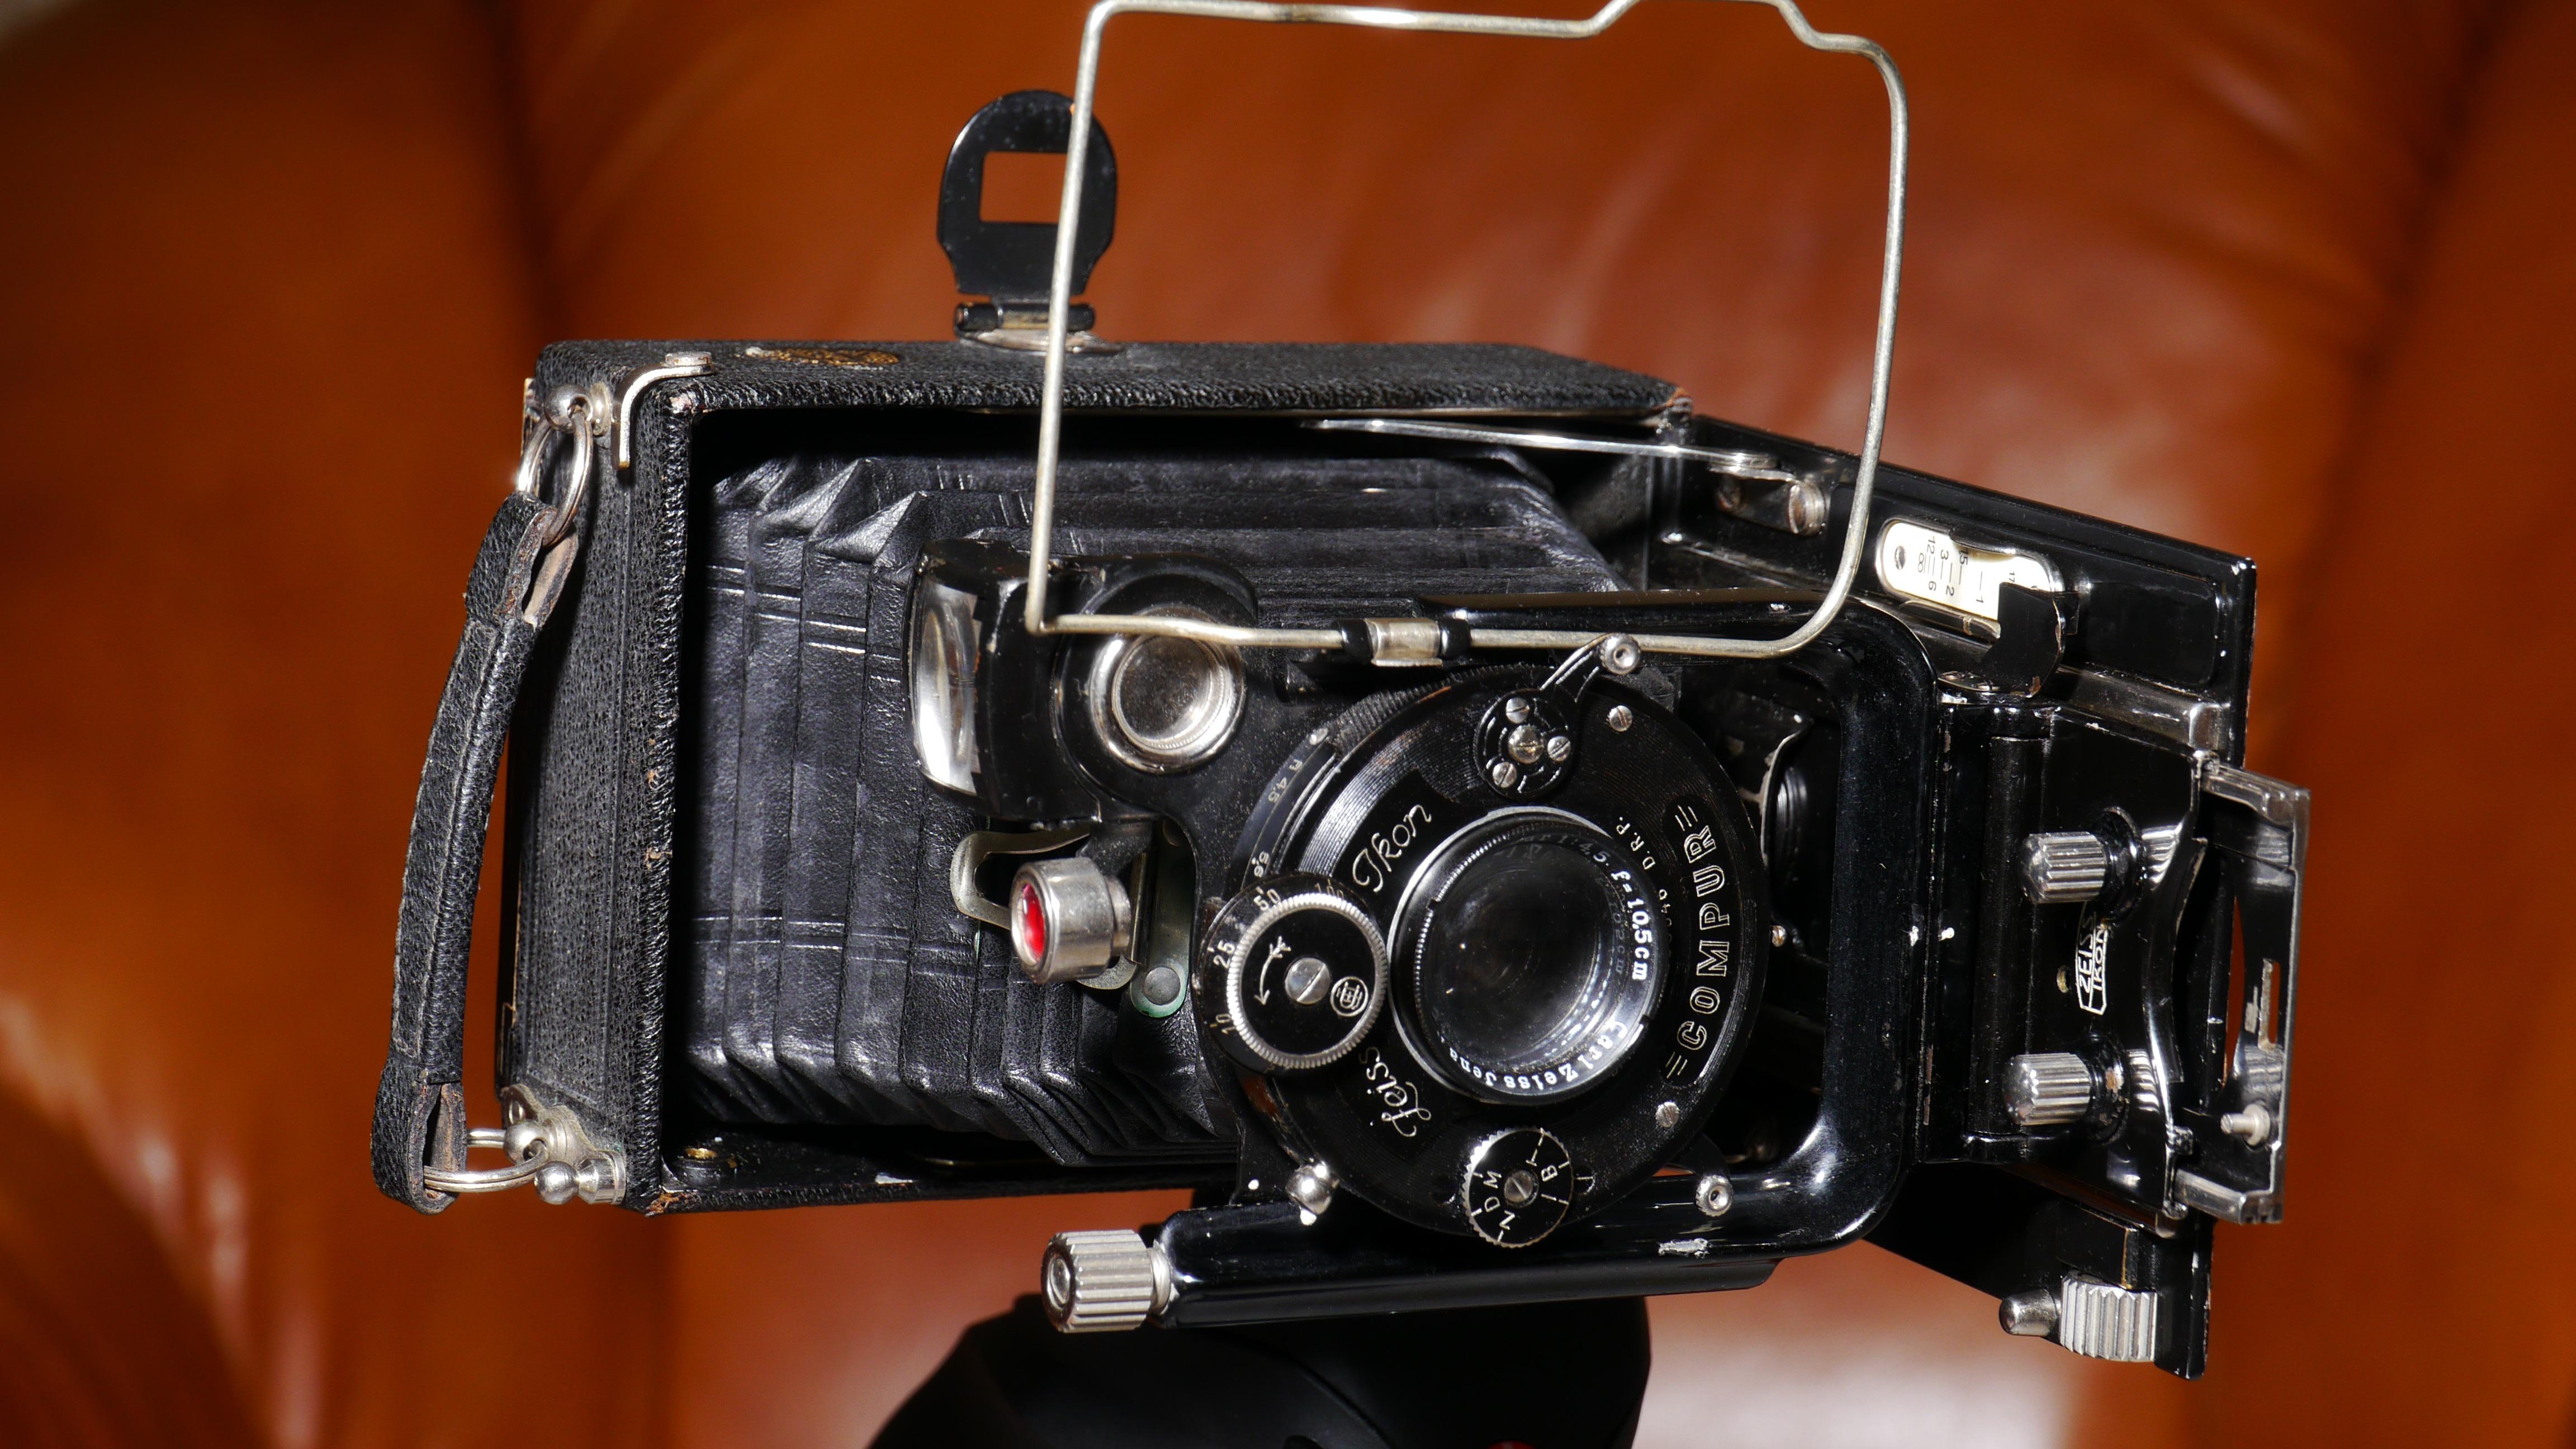 Free Images : vehicle, digital camera, engine, zeiss ikon, single